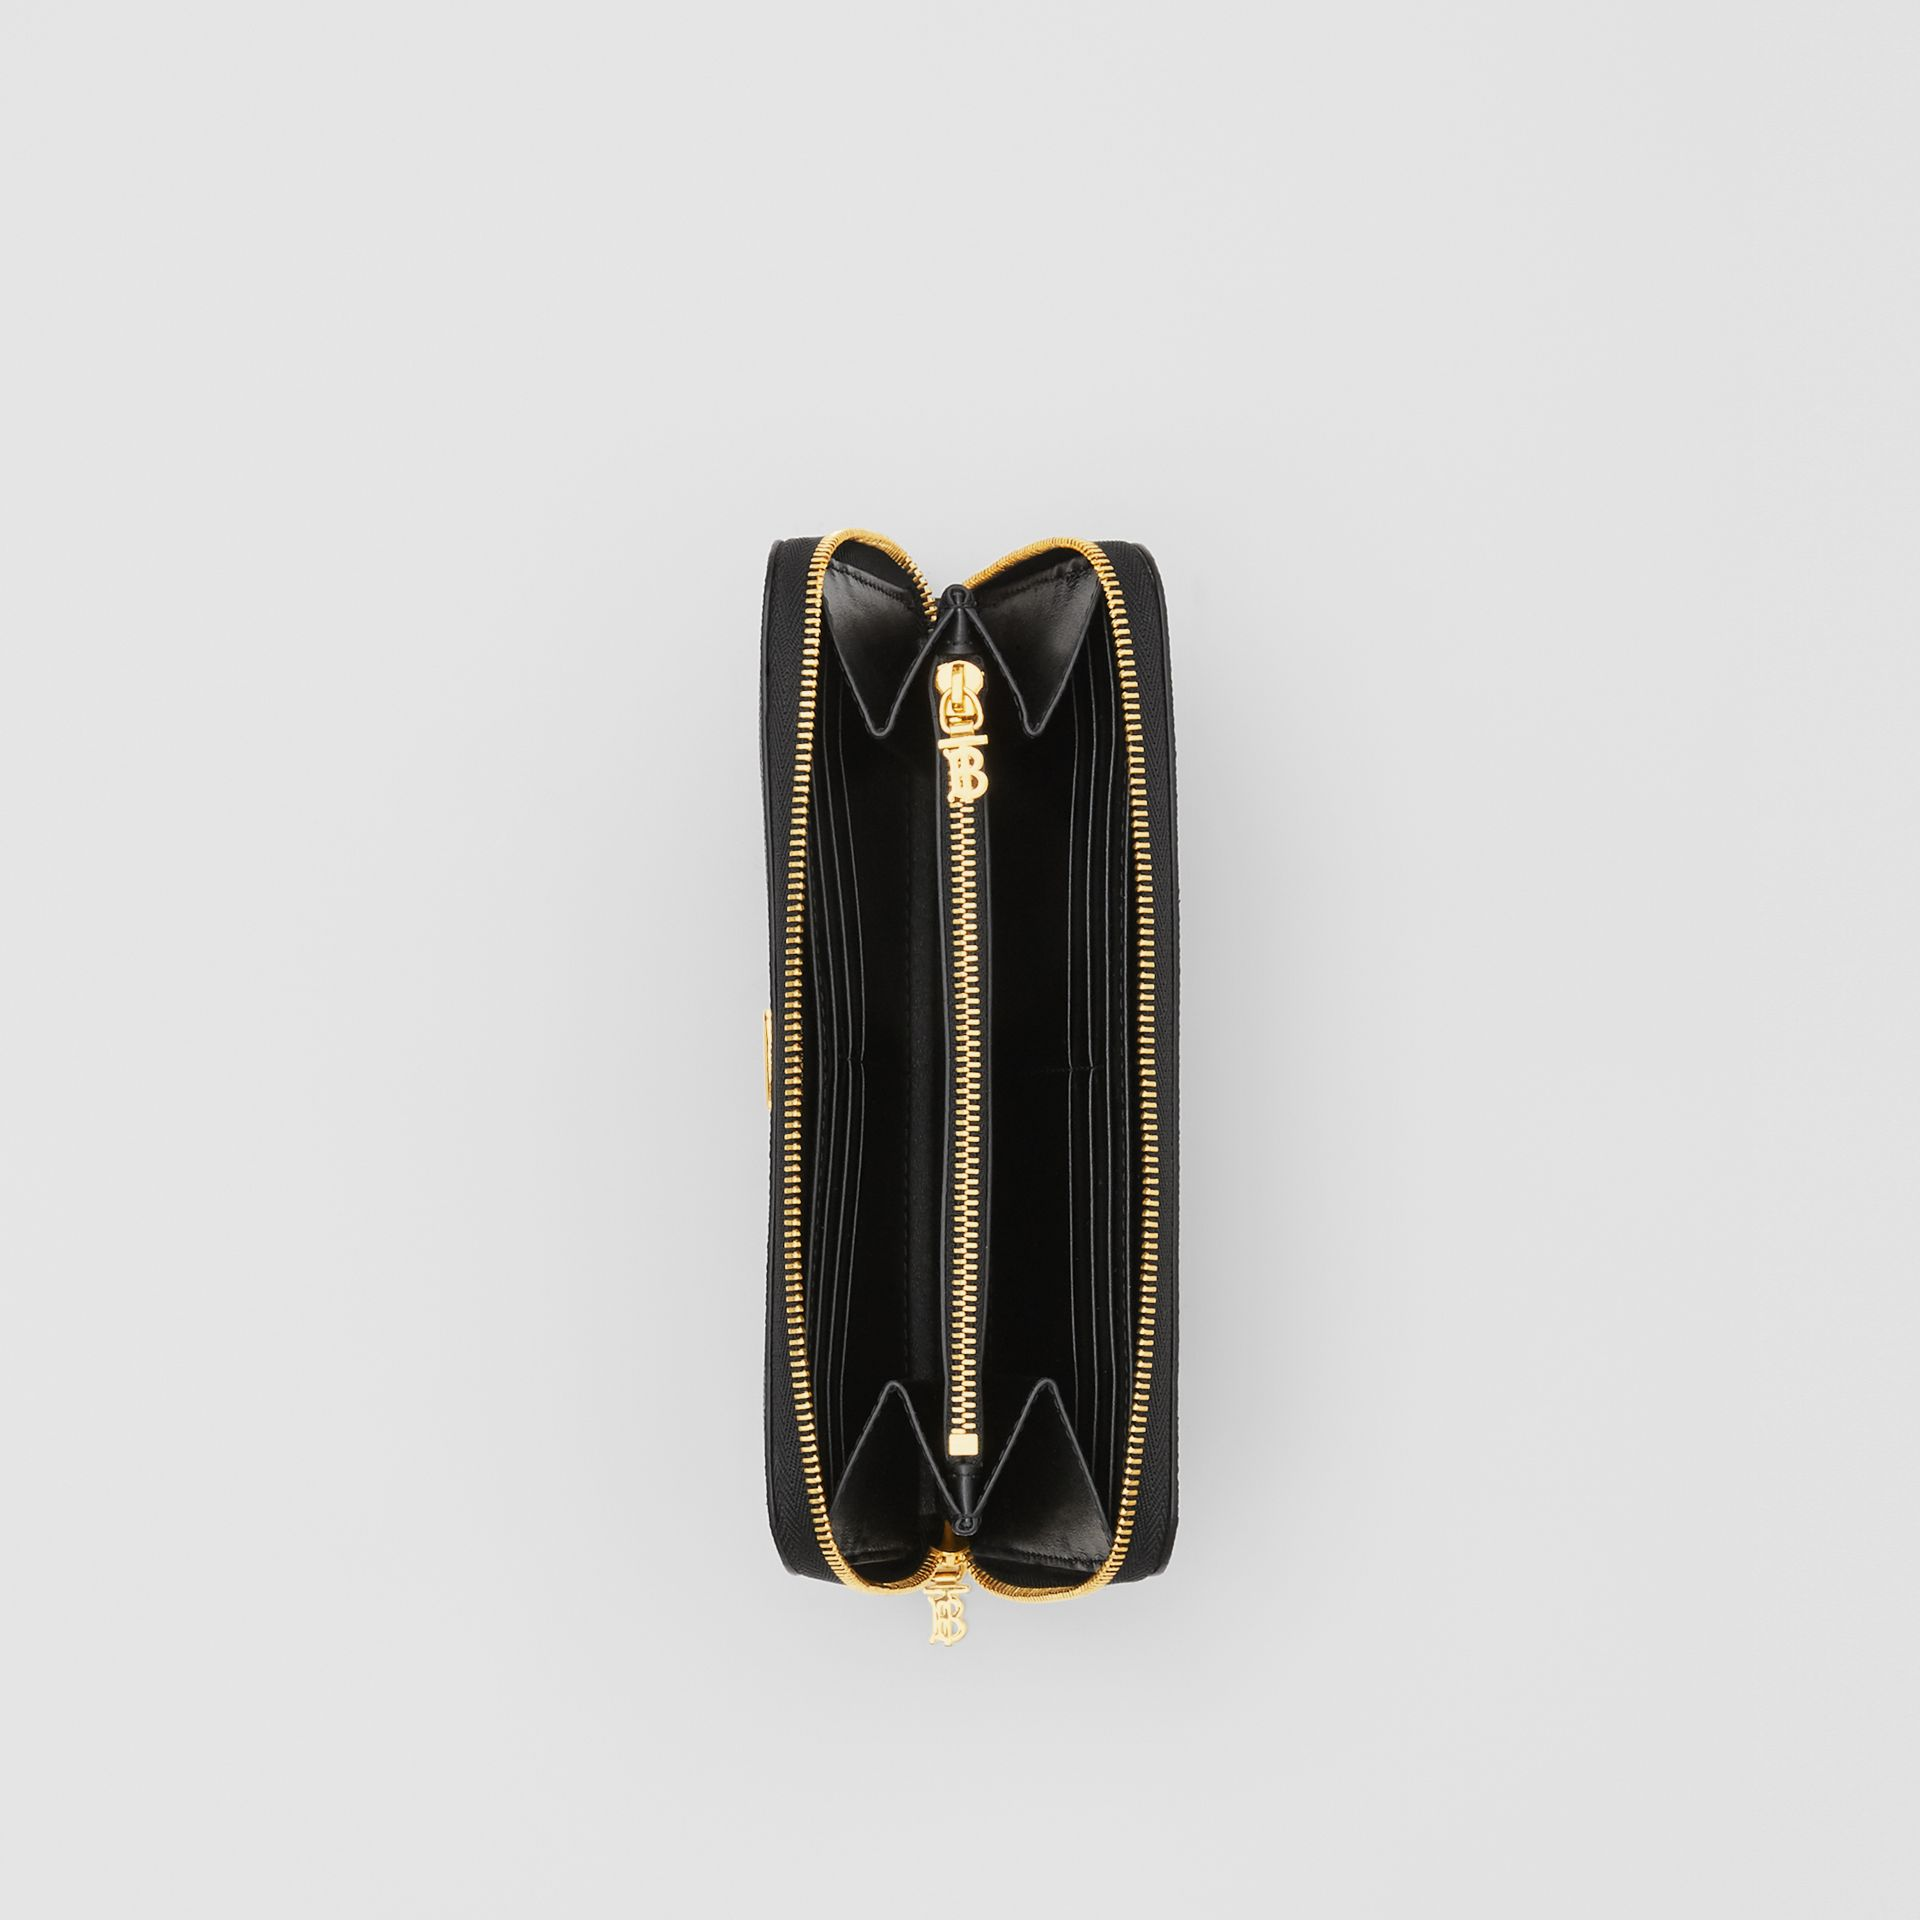 Monogram Motif Grainy Leather Ziparound Wallet in Black - Women | Burberry Australia - gallery image 3